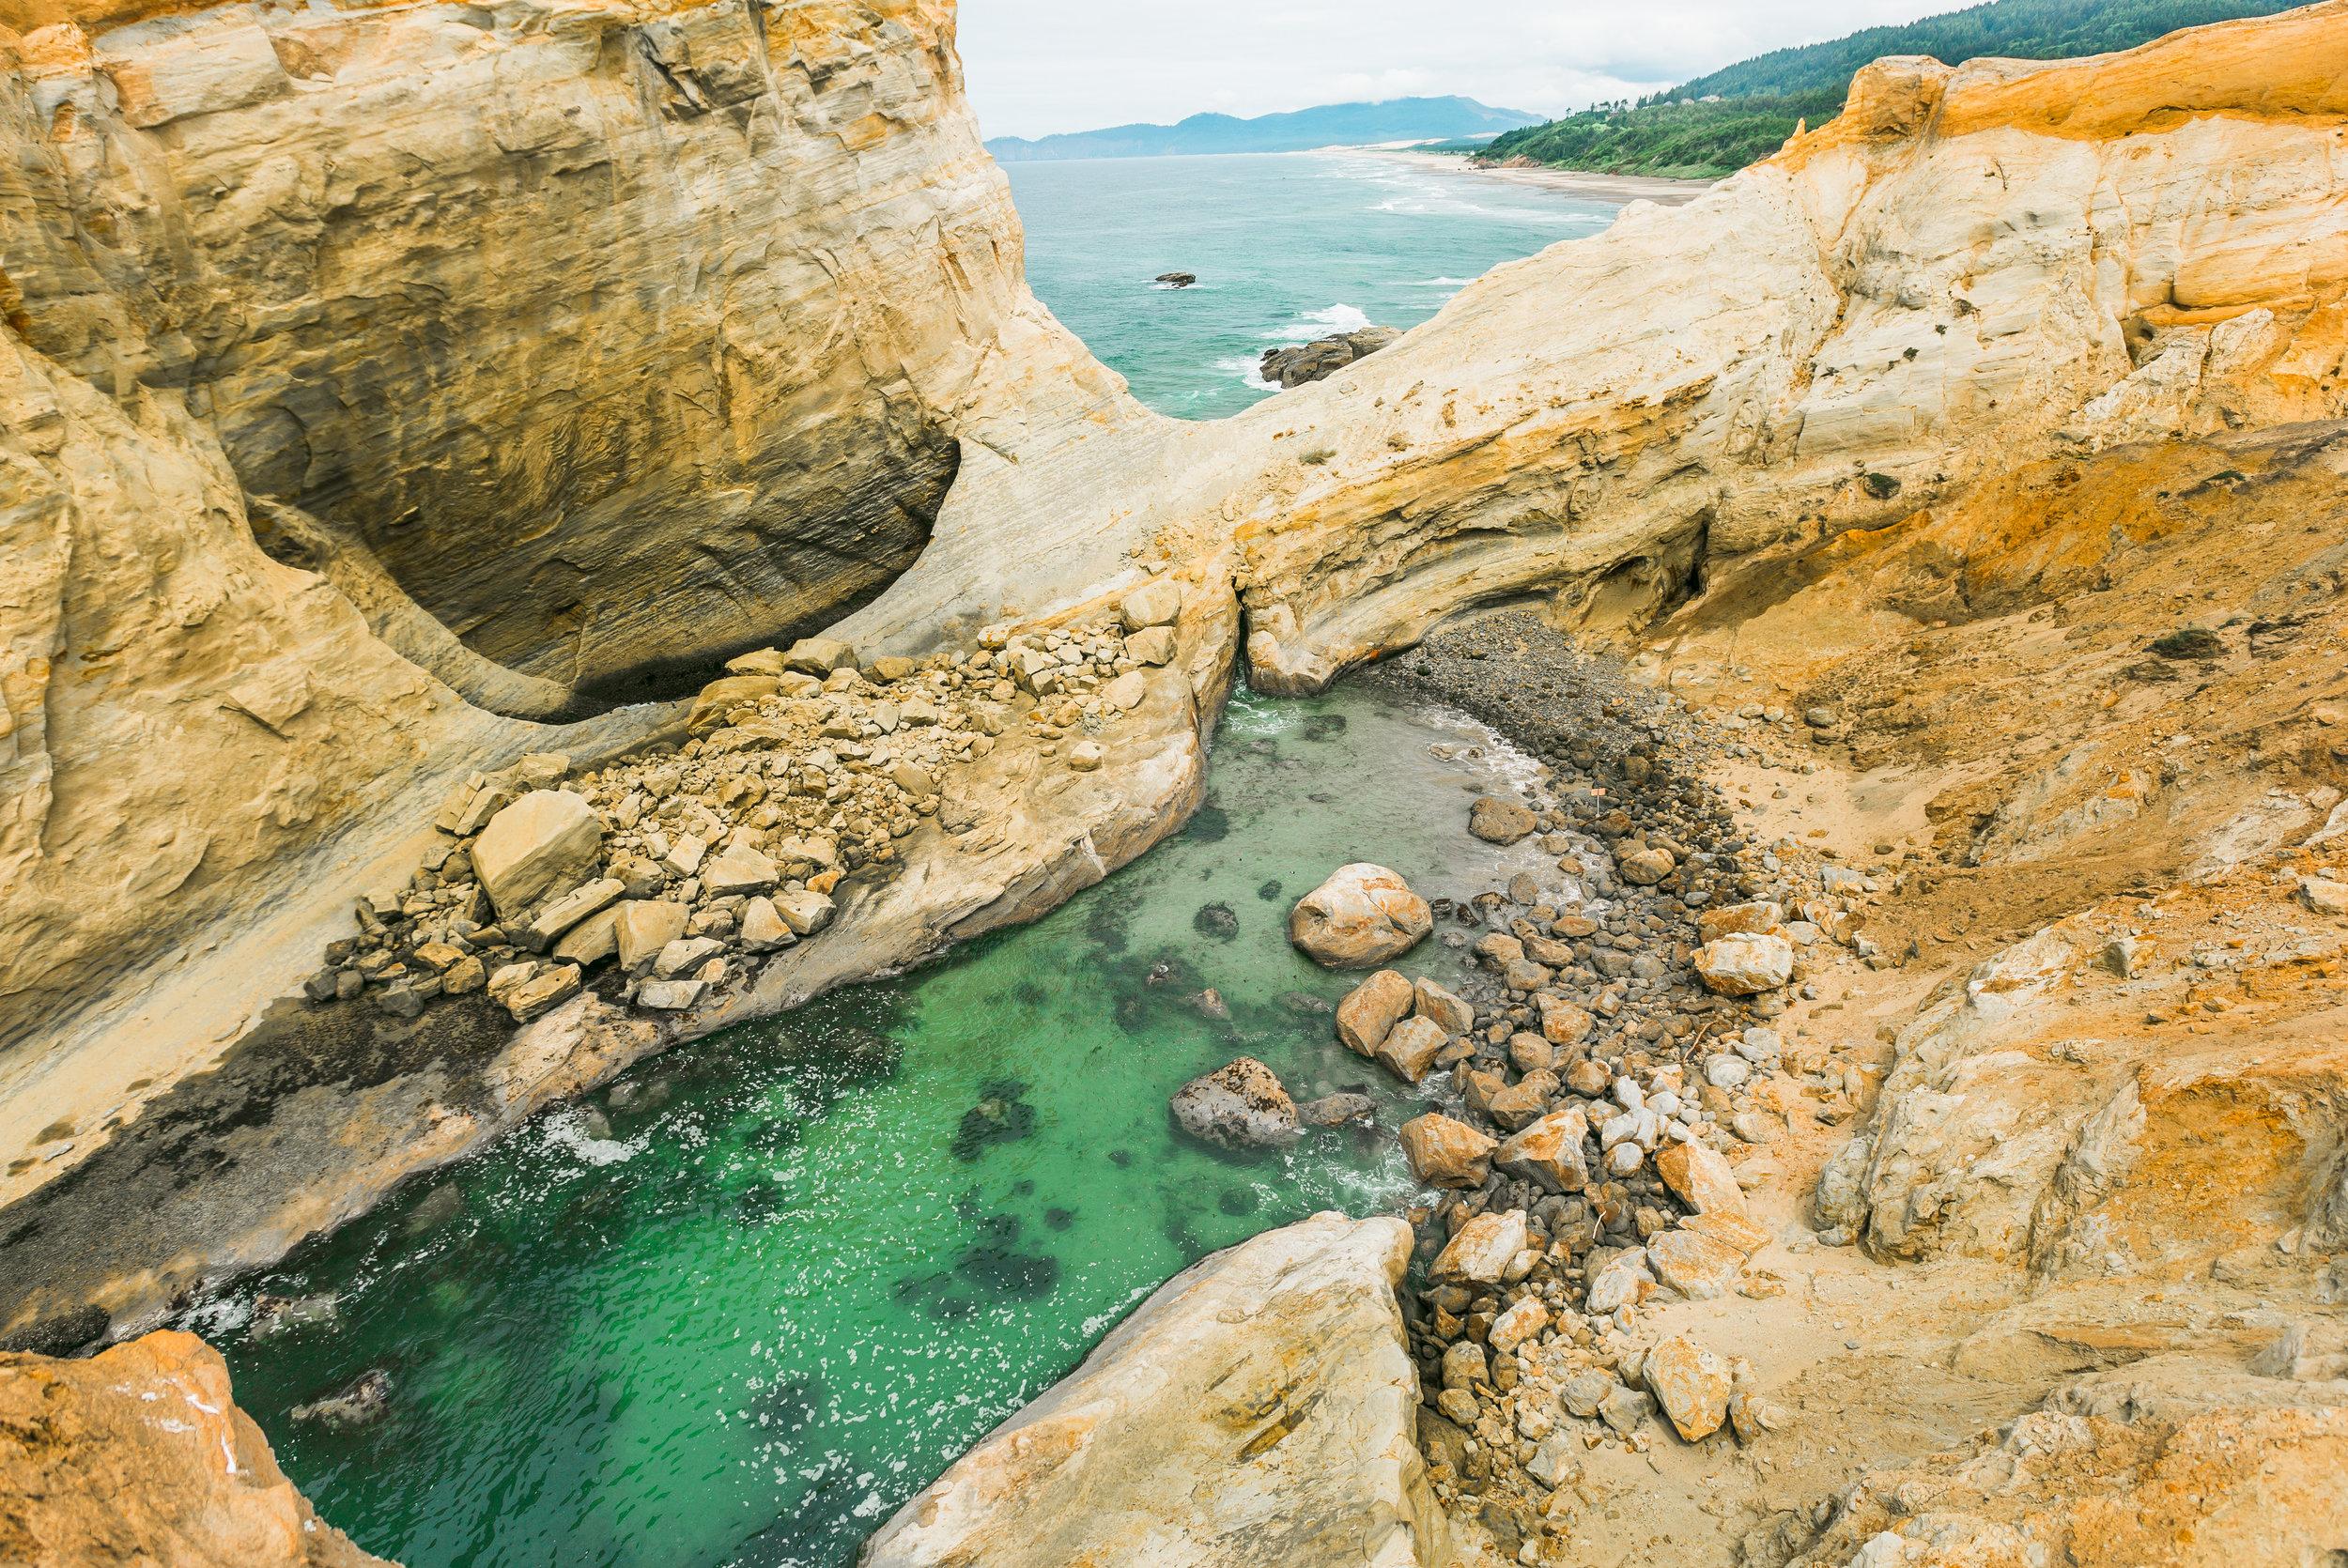 nicole-daacke-photography-oregon-coast-landscapes-elopement-photographer-wedding-photography-adventure-lifestyle-roadtrip-along-oregon-coast-cape-kiwanda-oceanside-beach-cannon-beach-oregon-pnw-10.jpg